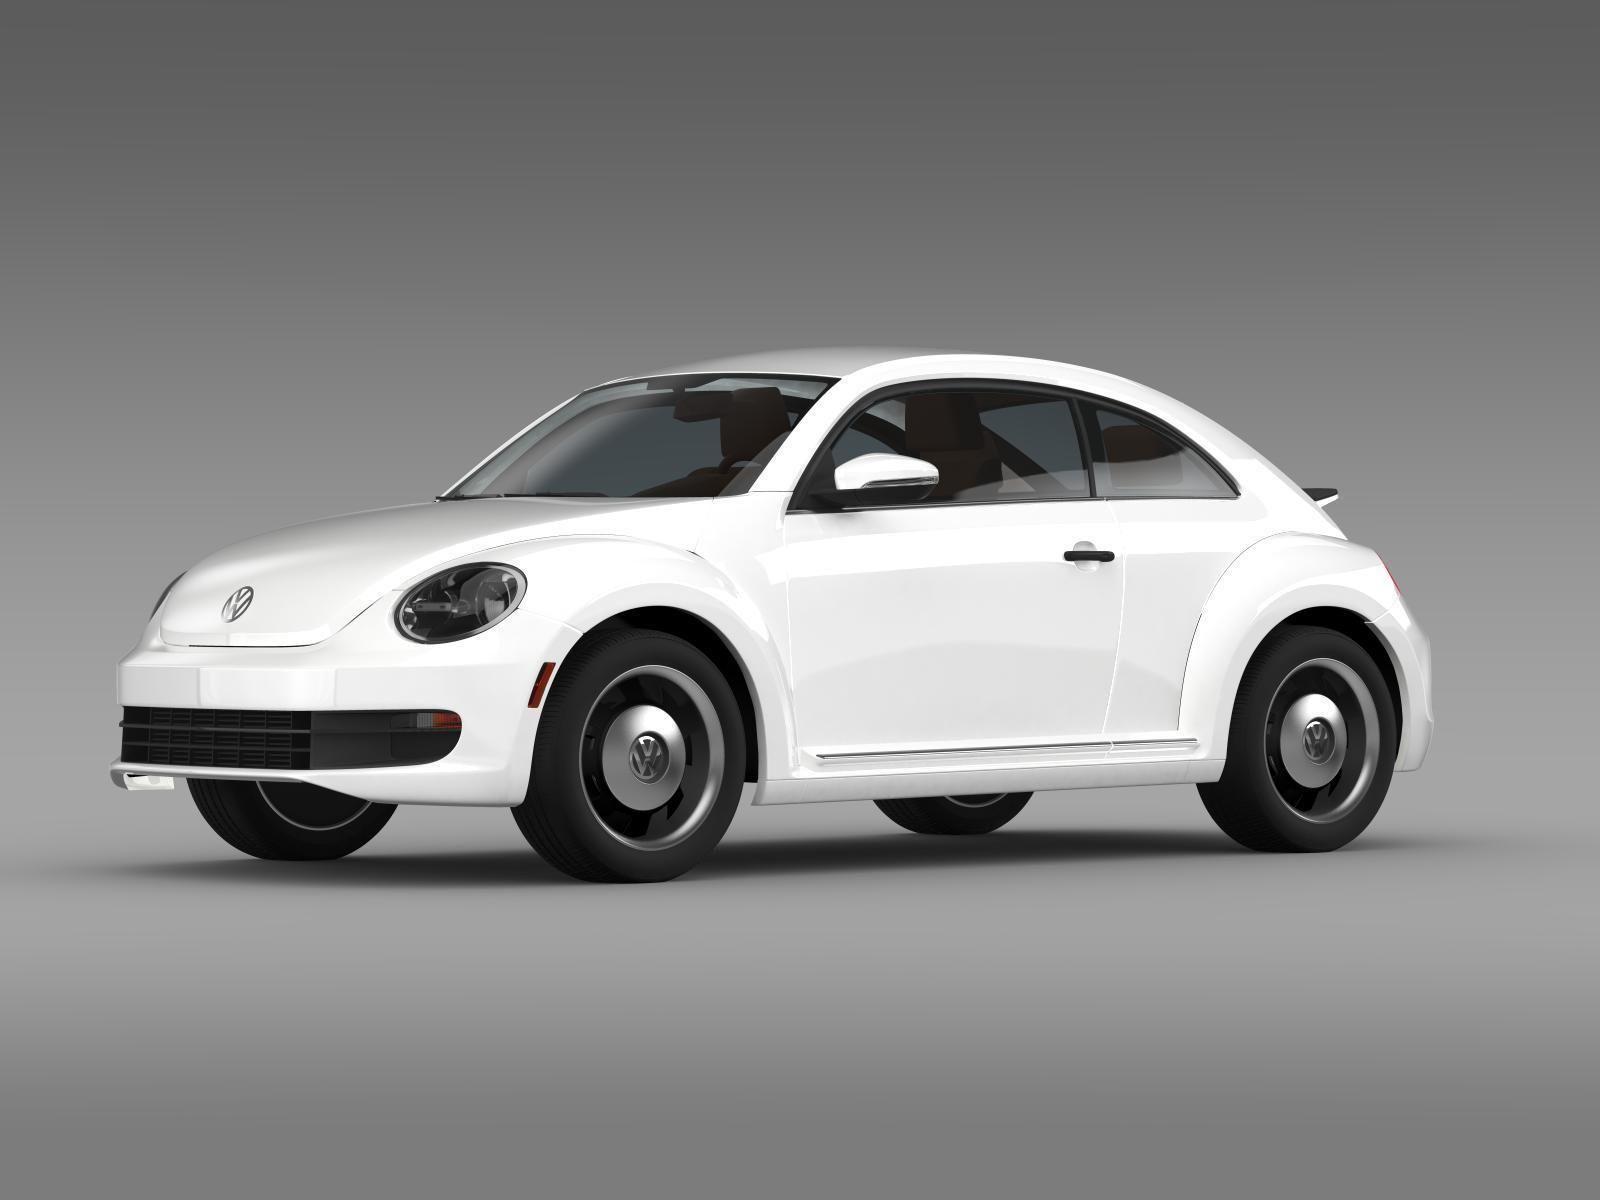 volkswagen beetle classic 2015 3d model max obj 3ds fbx c4d lwo lw lws. Black Bedroom Furniture Sets. Home Design Ideas